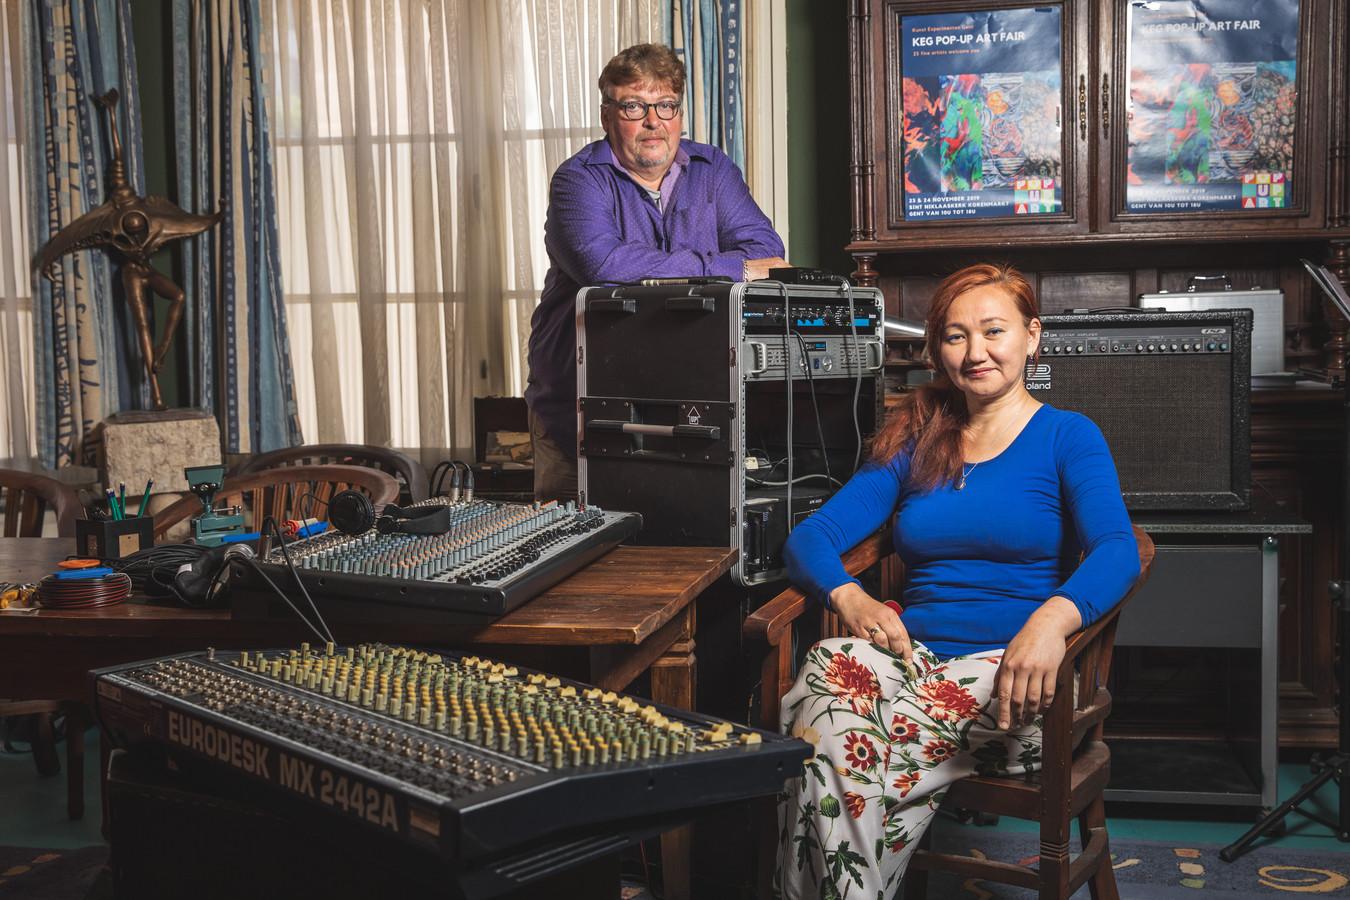 Freddy Jacobs en Gulzhaina Kydyrova, de bestuurders van muziekschool Mezzos in Ledeberg.